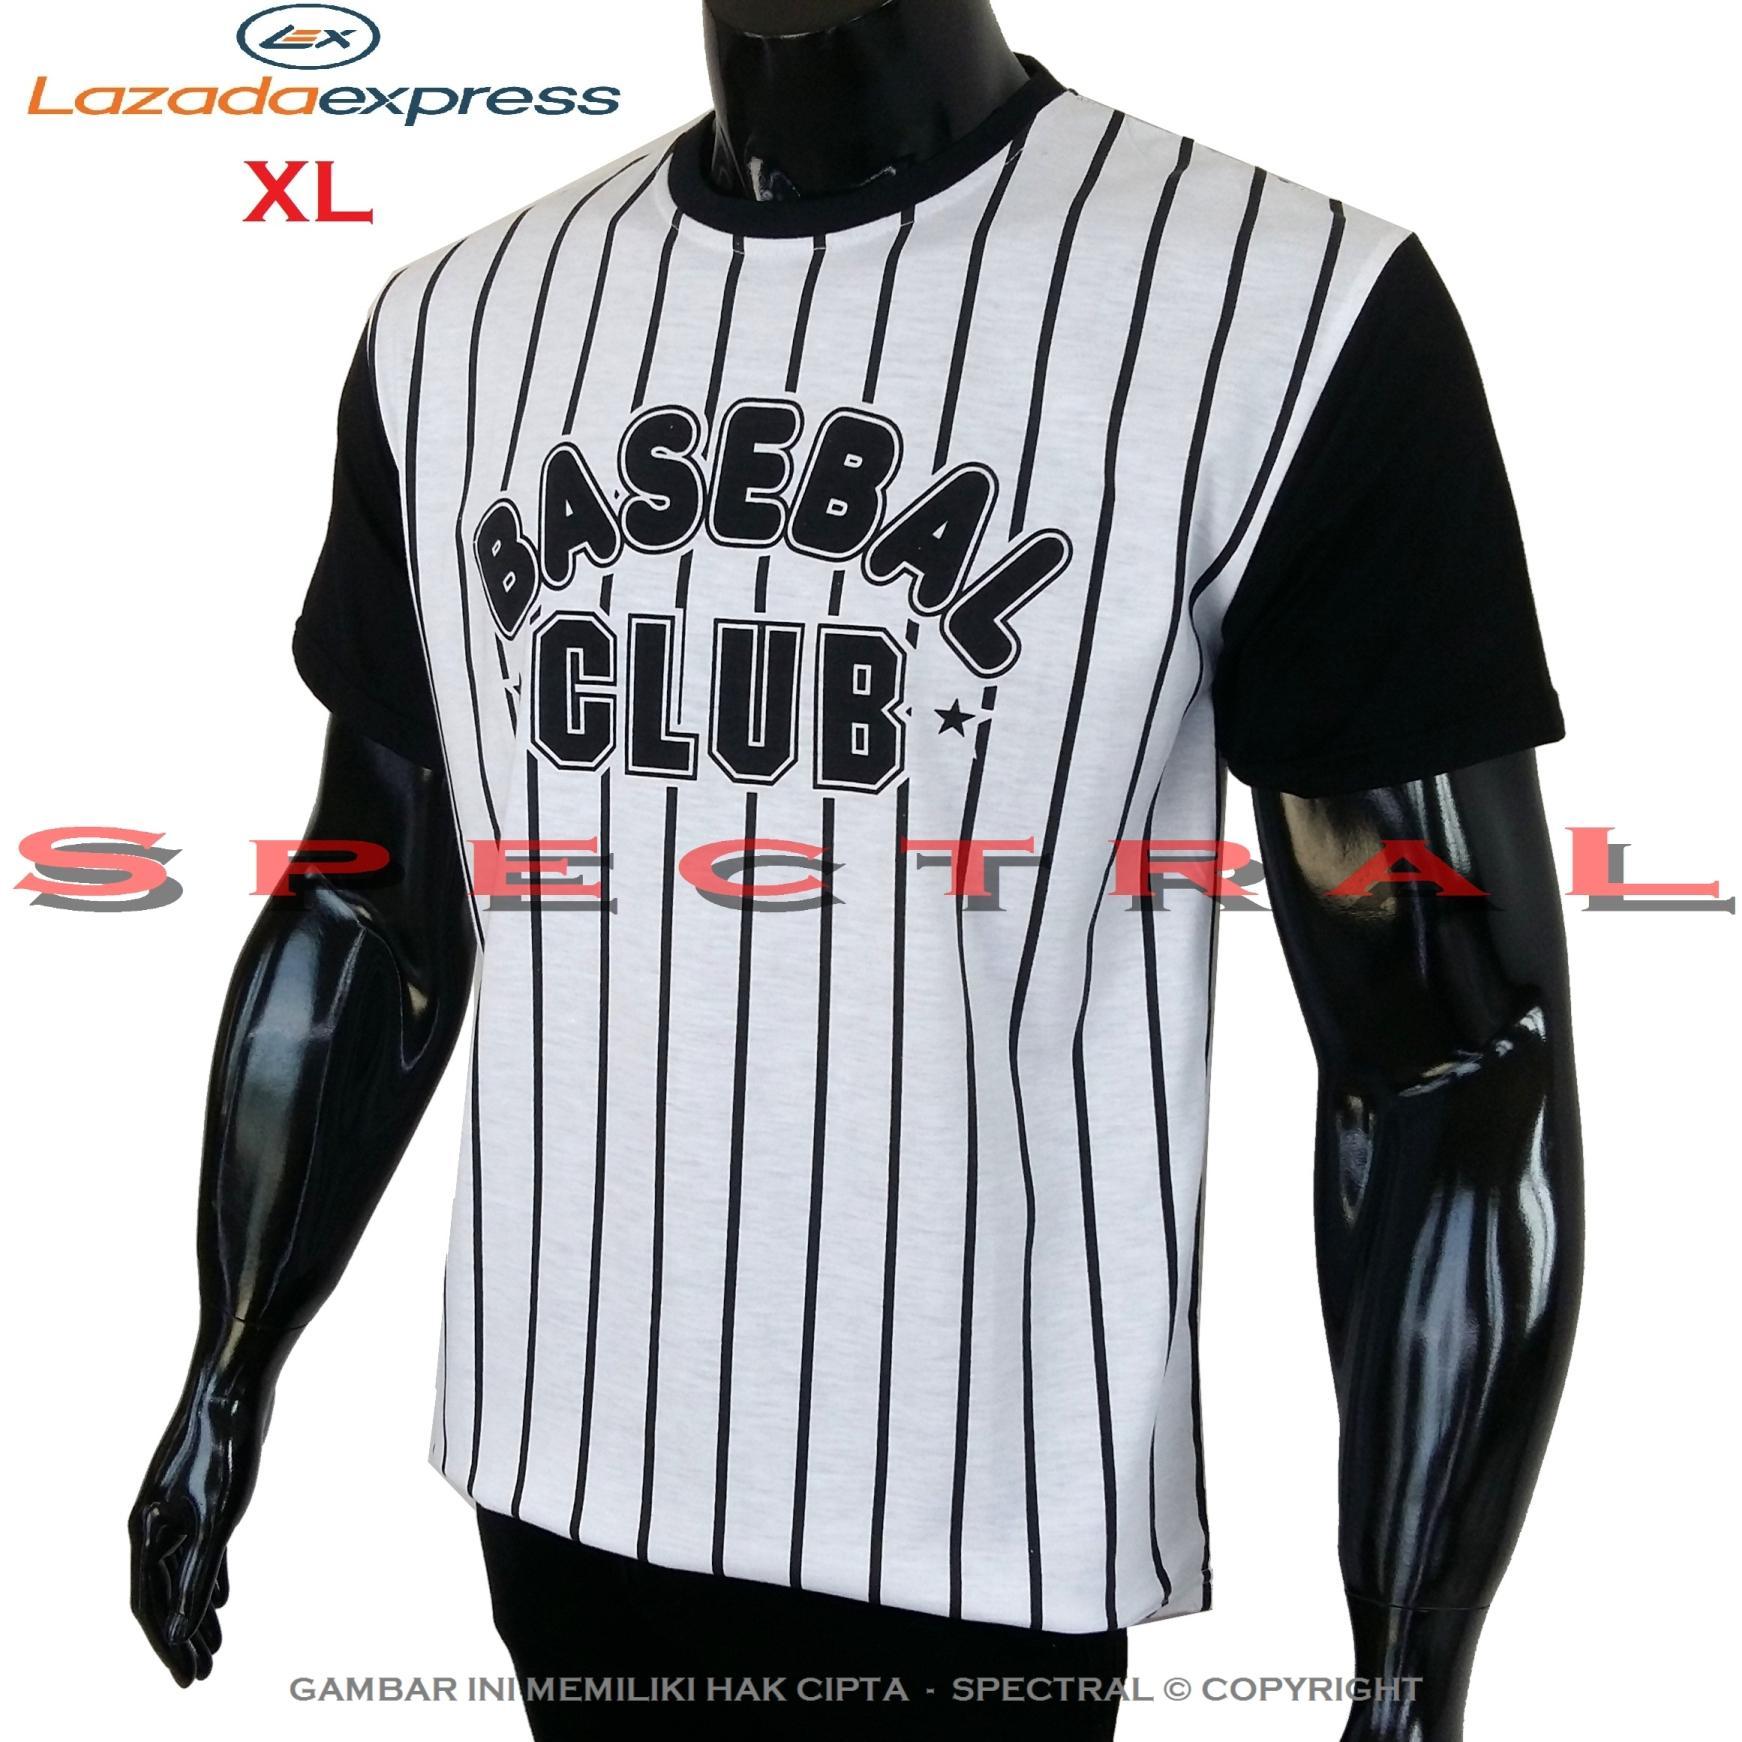 Spectral – Kaos L / XL Baseball Distro Fashion T-Shirt Cotton Pria Wanita Cewe Cowo Baju Pakaian Olahraga Sport Ukuran Besar Yangkee Base Ball Rap Hop Hiphop Atasan Keren Murah Bagus Jakarta Bandung Kekinian Jaman Tulisan Bisbol Basket Salur Putih